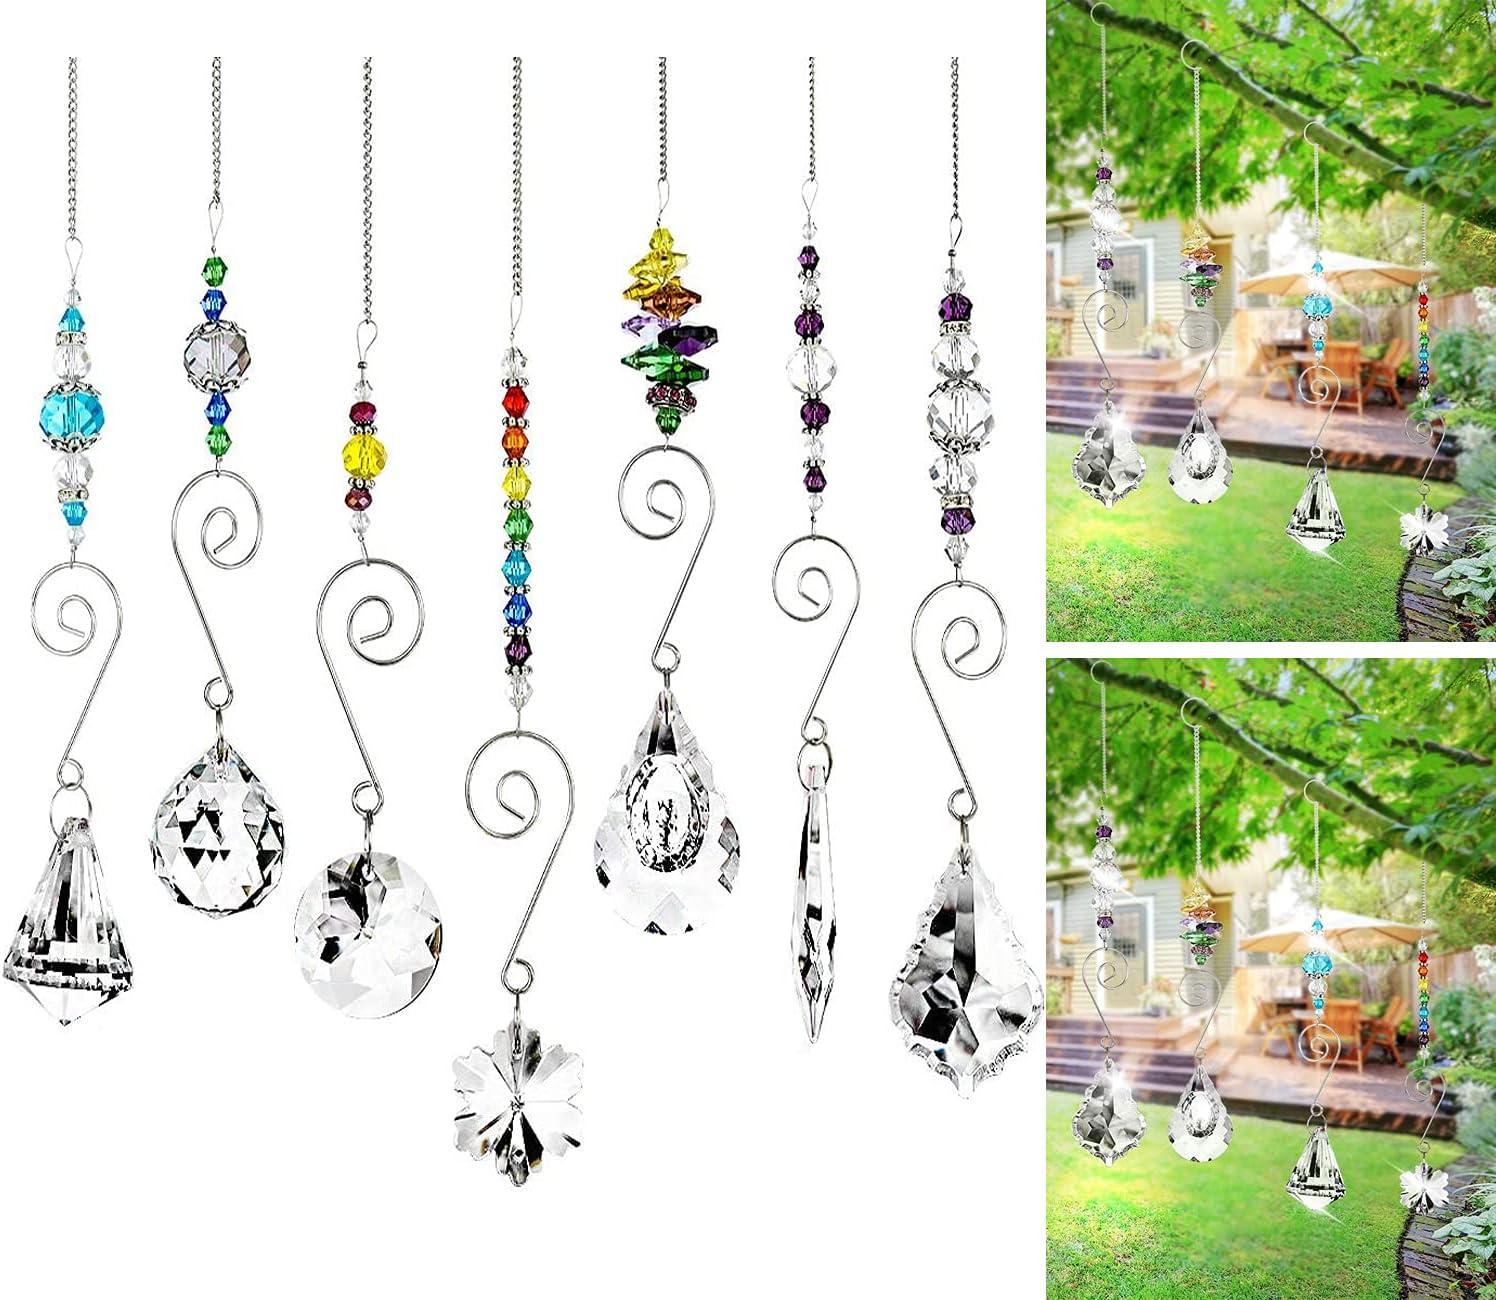 7 Pieces Crystal Suncatcher, Colorful Suncatcher Hanging Ornament Rainbow Maker for Gift, Garden Decoration, Window, Home, Office, Plants, Cars, Wedding, Feng Shui Decor